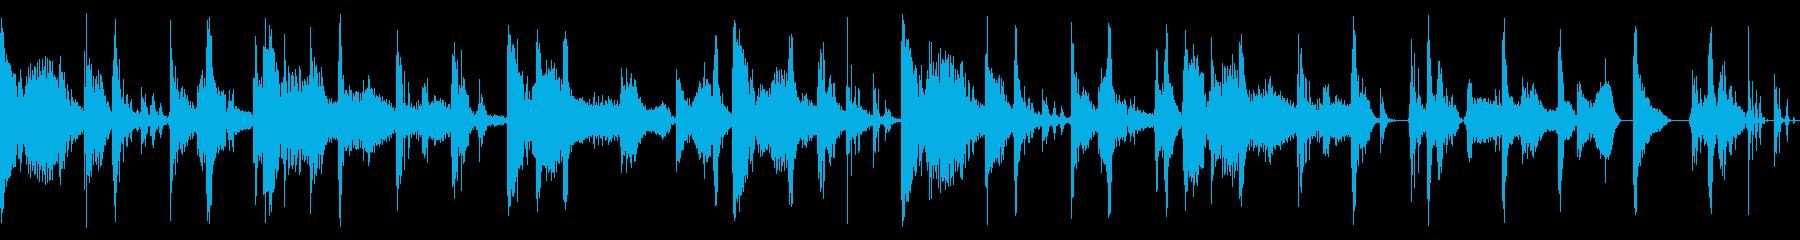 2-stepのリズムにファンクの再生済みの波形